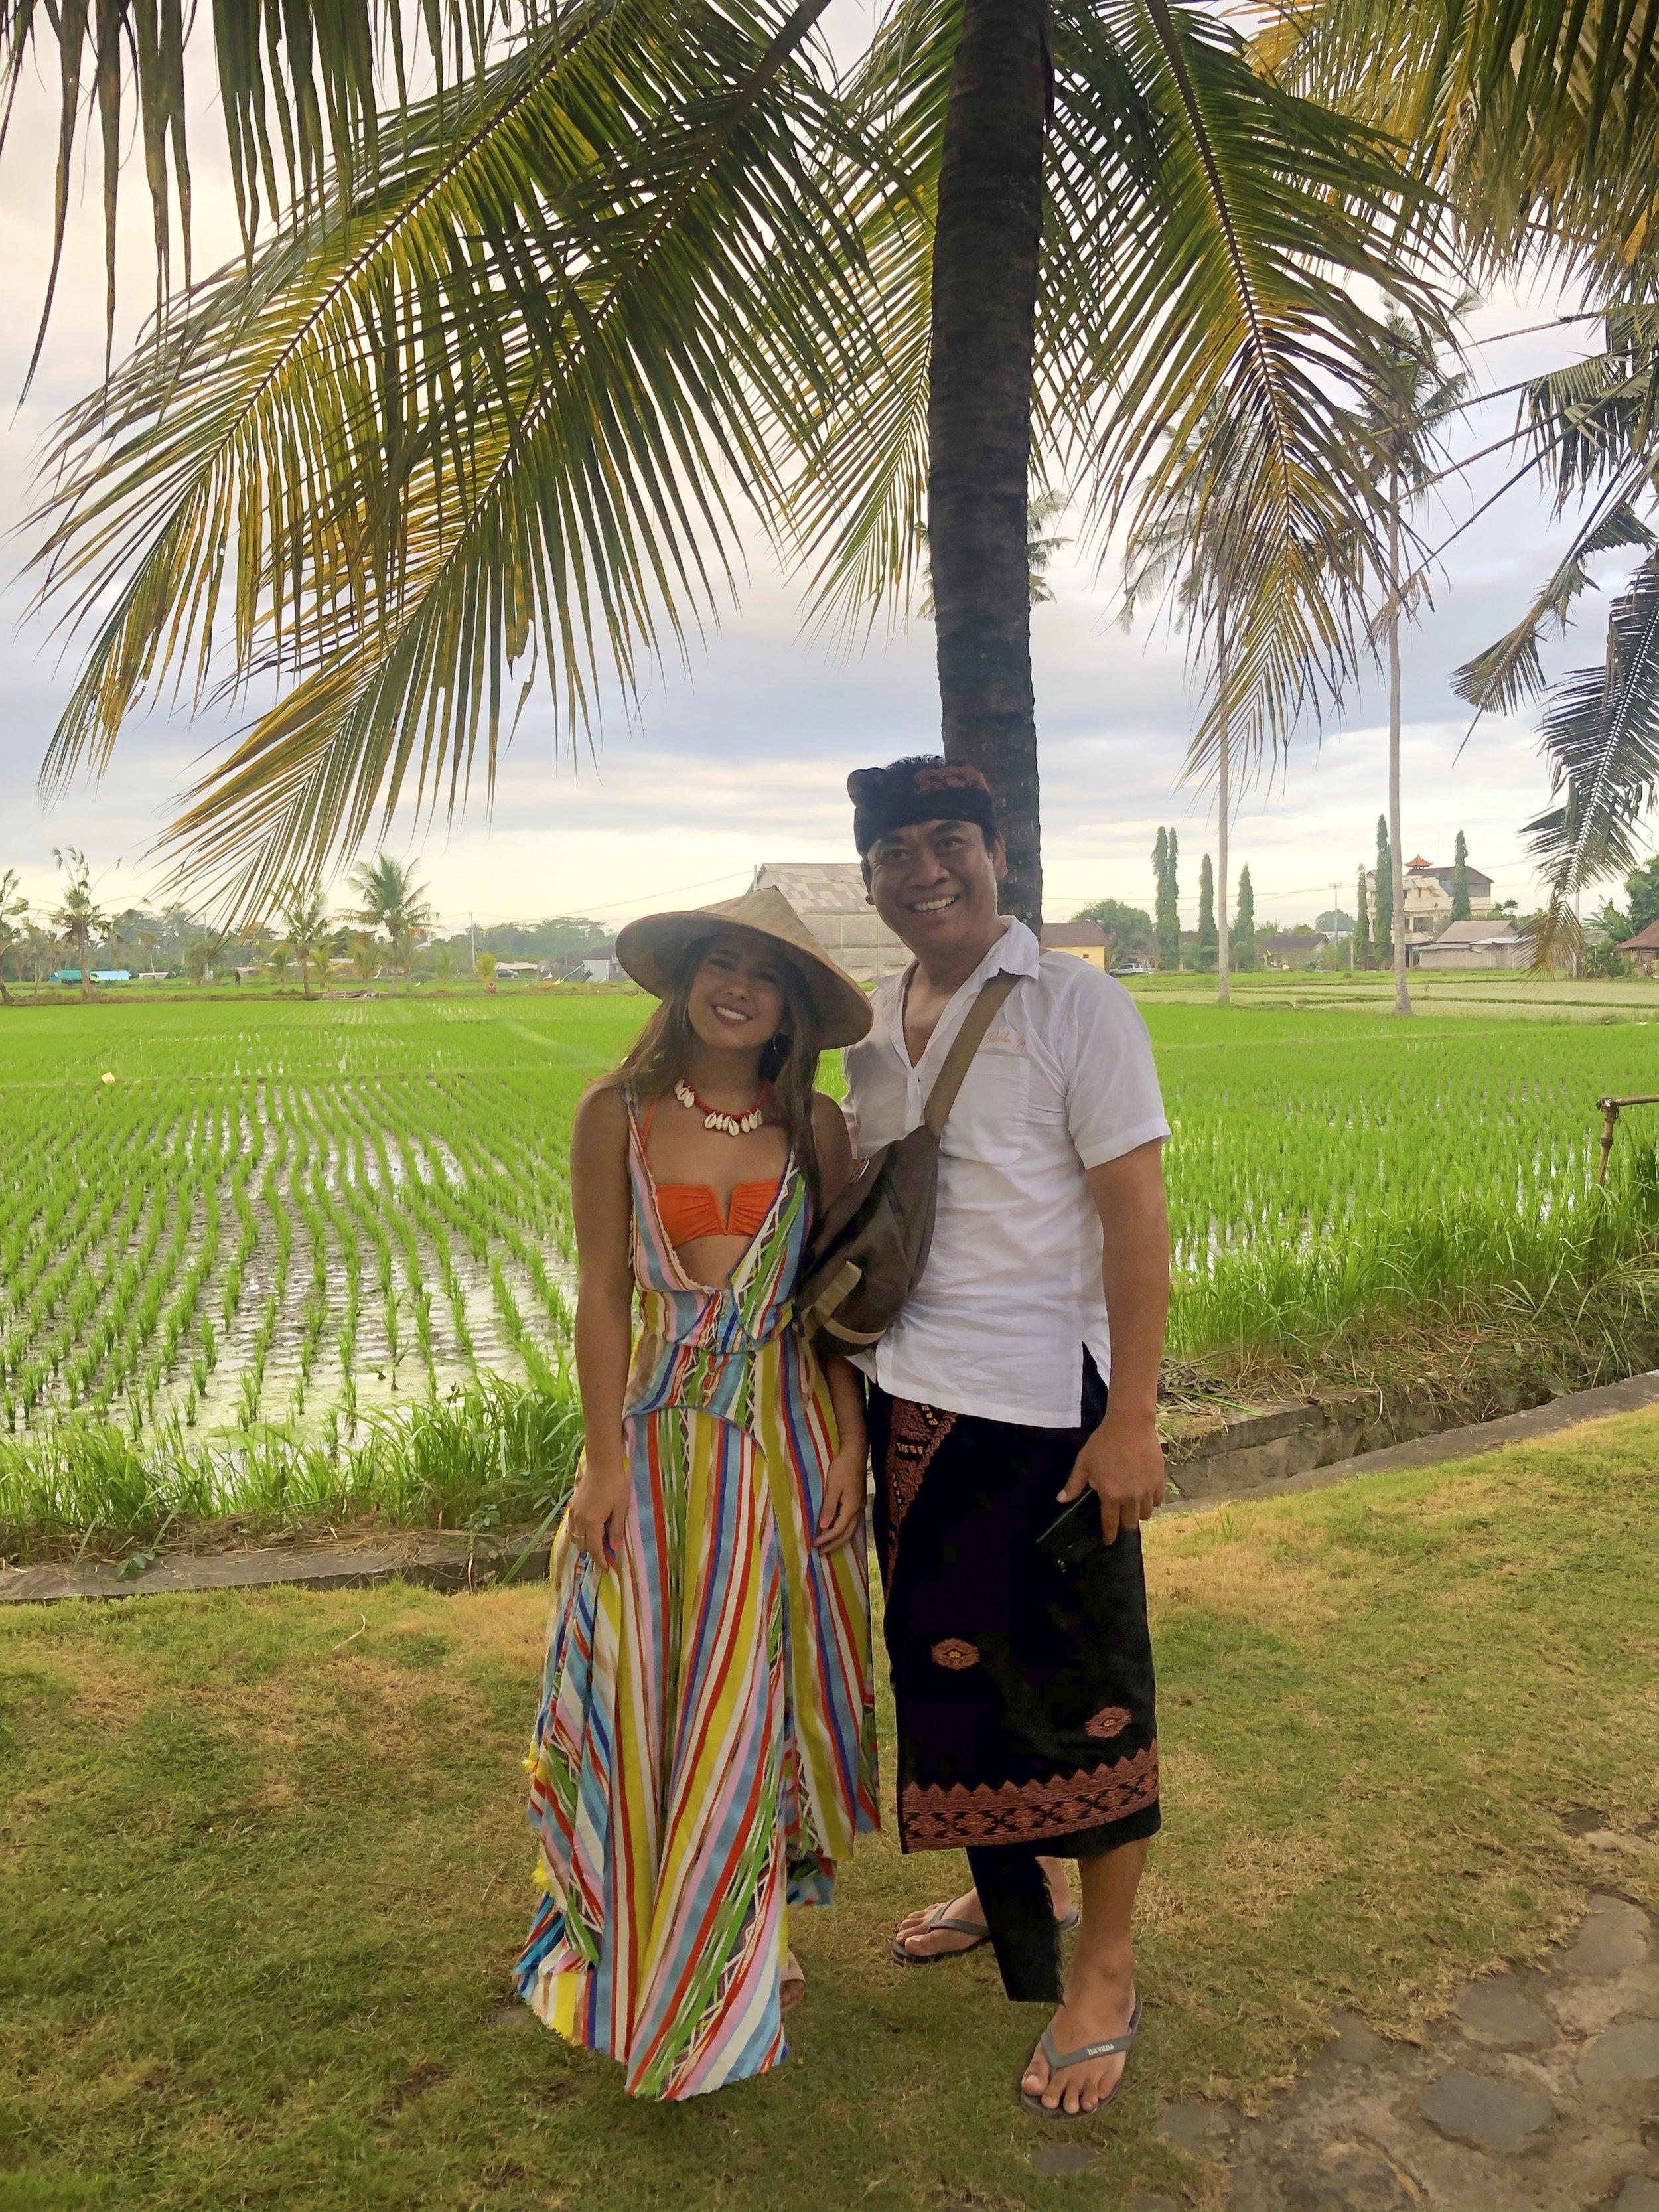 fashion travel blogger paloma de la cruz bali indonesia palomatravels coolness rice fields travel world